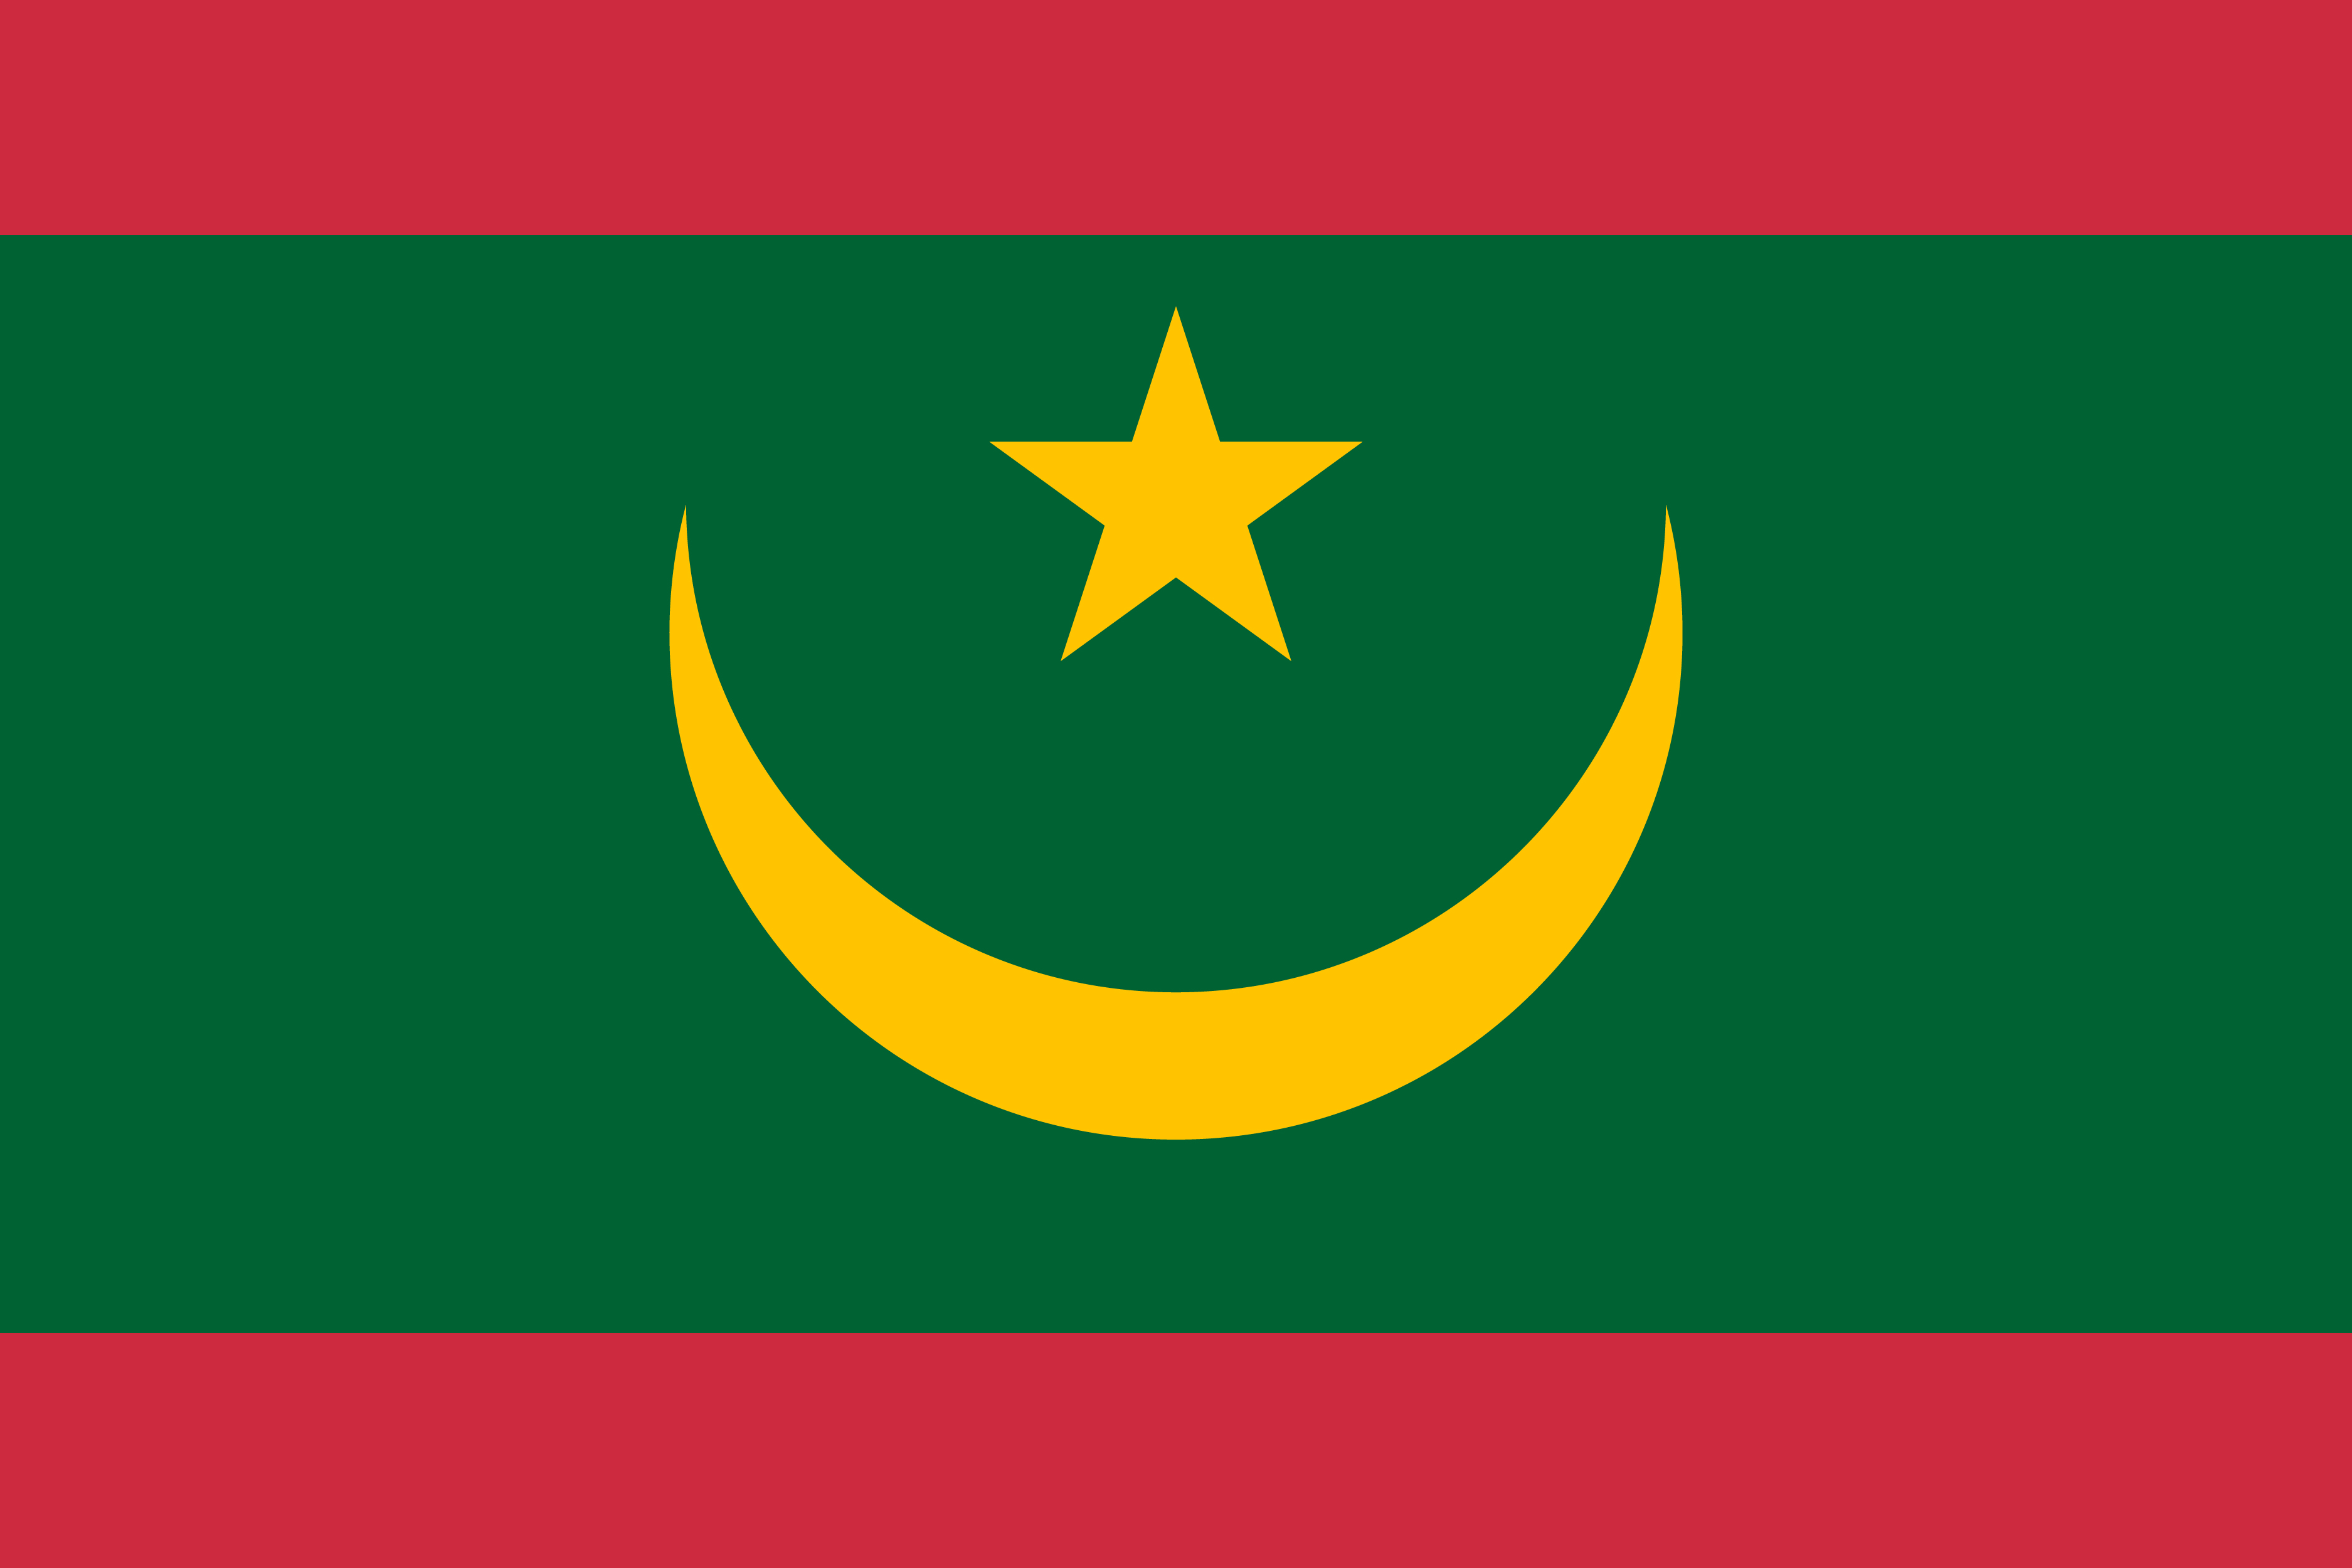 bandera adhesiva de Mauritania